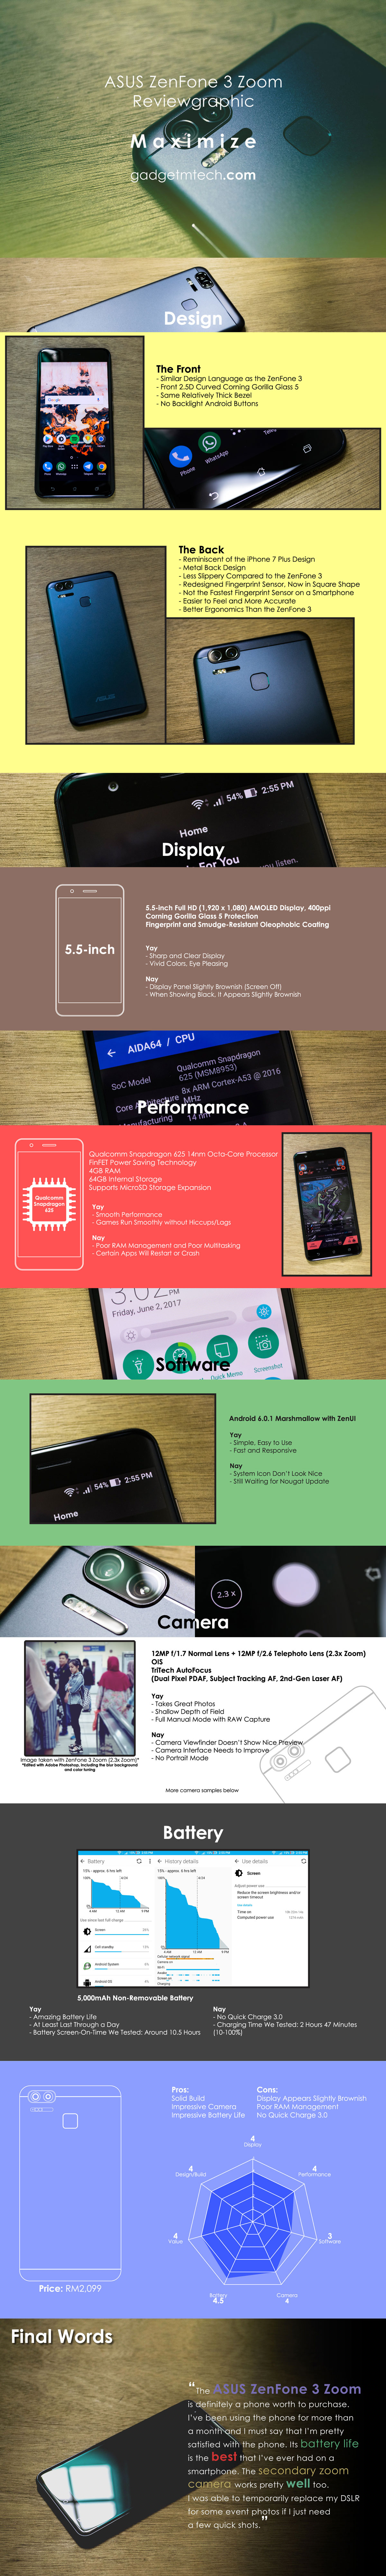 ASUS ZenFone 3 Zoom Reviewgraphic